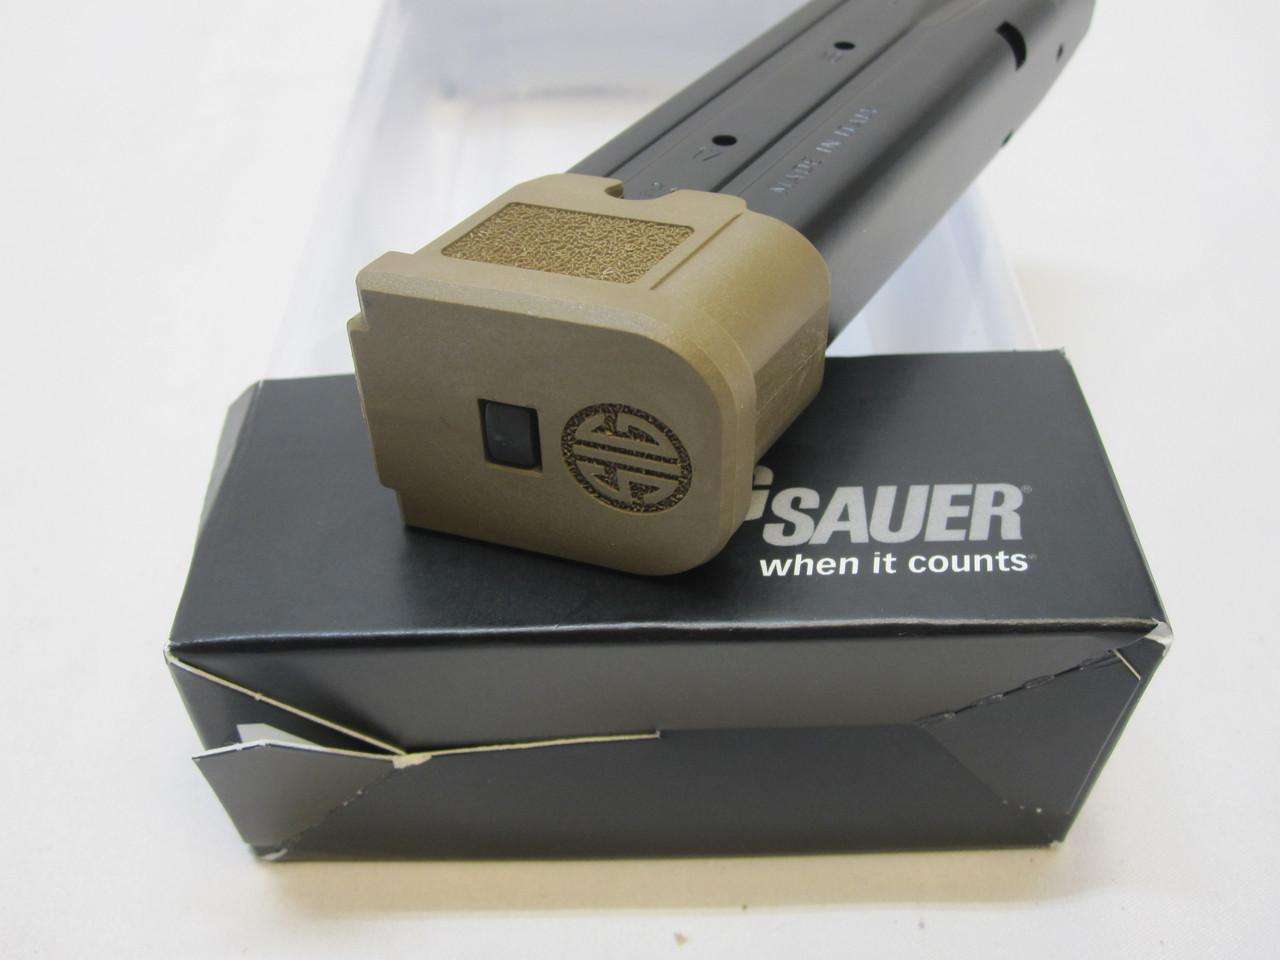 SIG SAUER M17 P320 EXTENDED HIGH CAPACITY 21 ROUND MAGAZINE